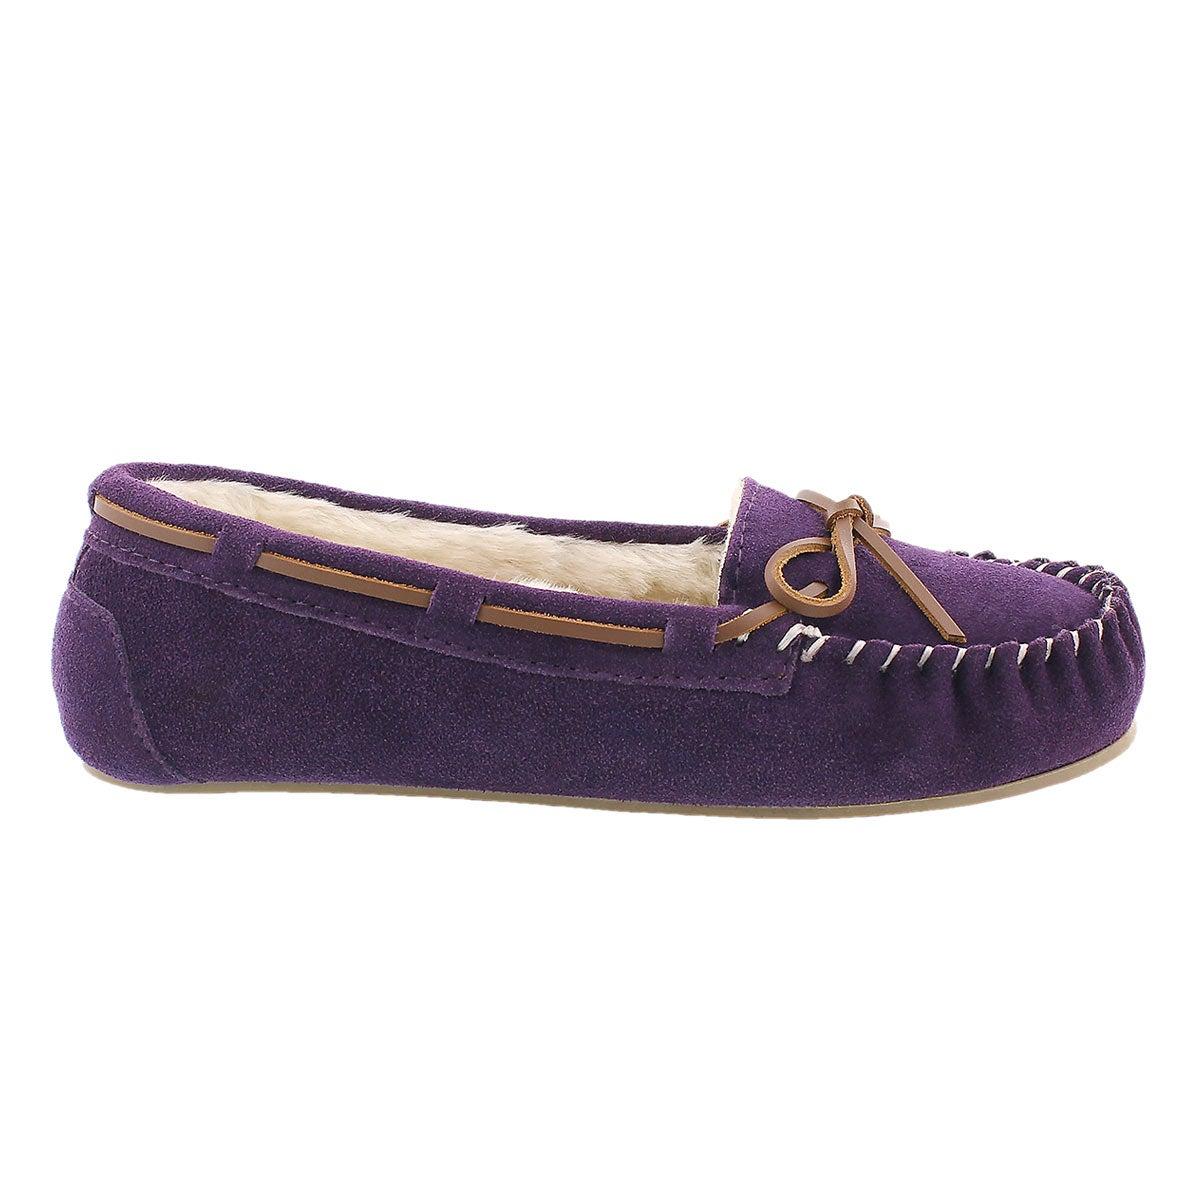 Lds Bali II purple suede ballerina moc